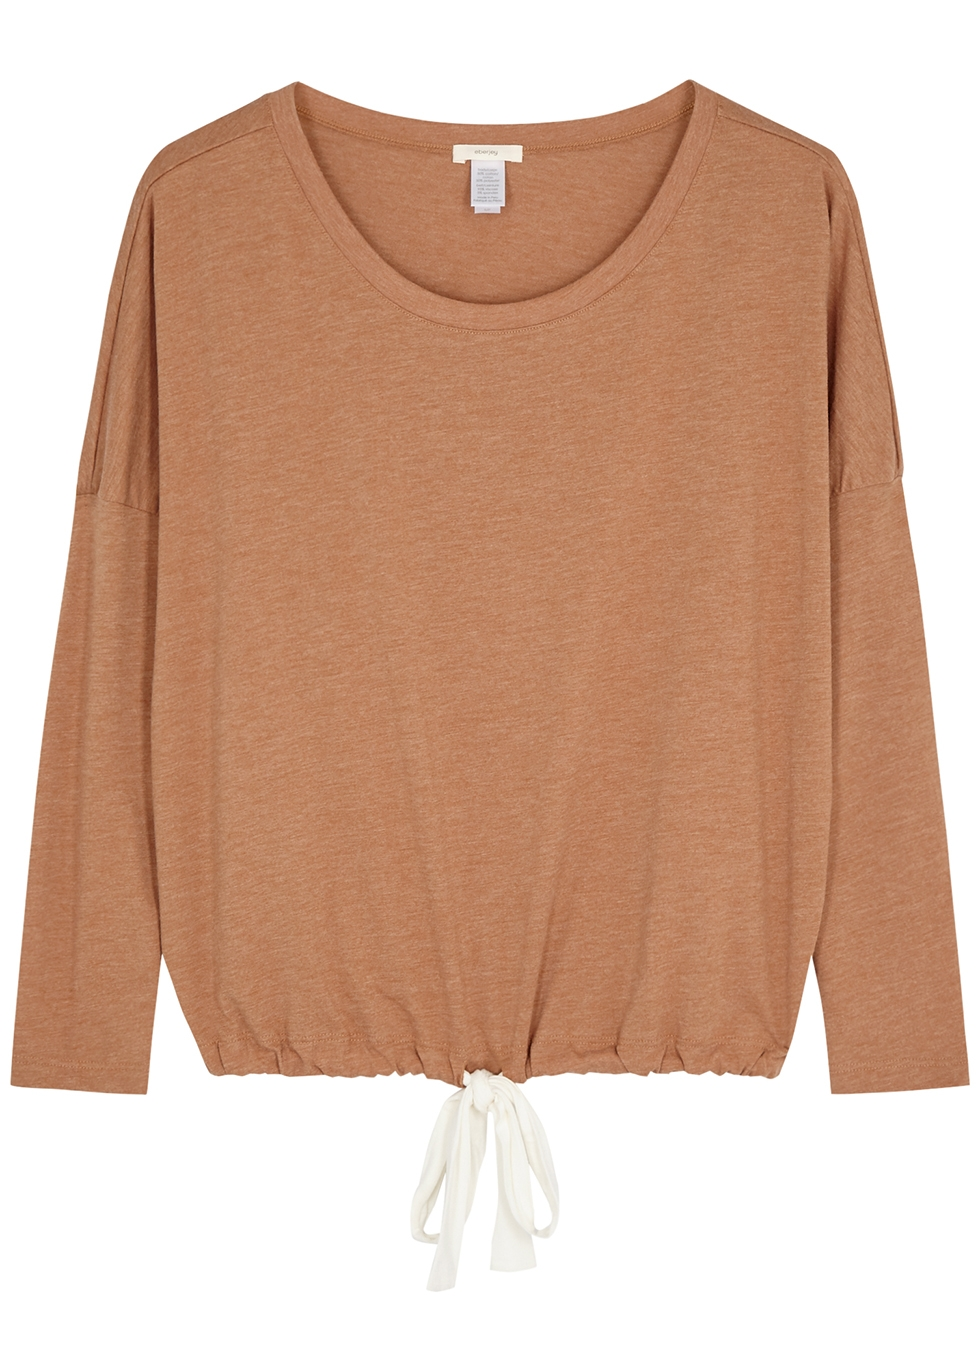 Heather camel jersey pyjama top